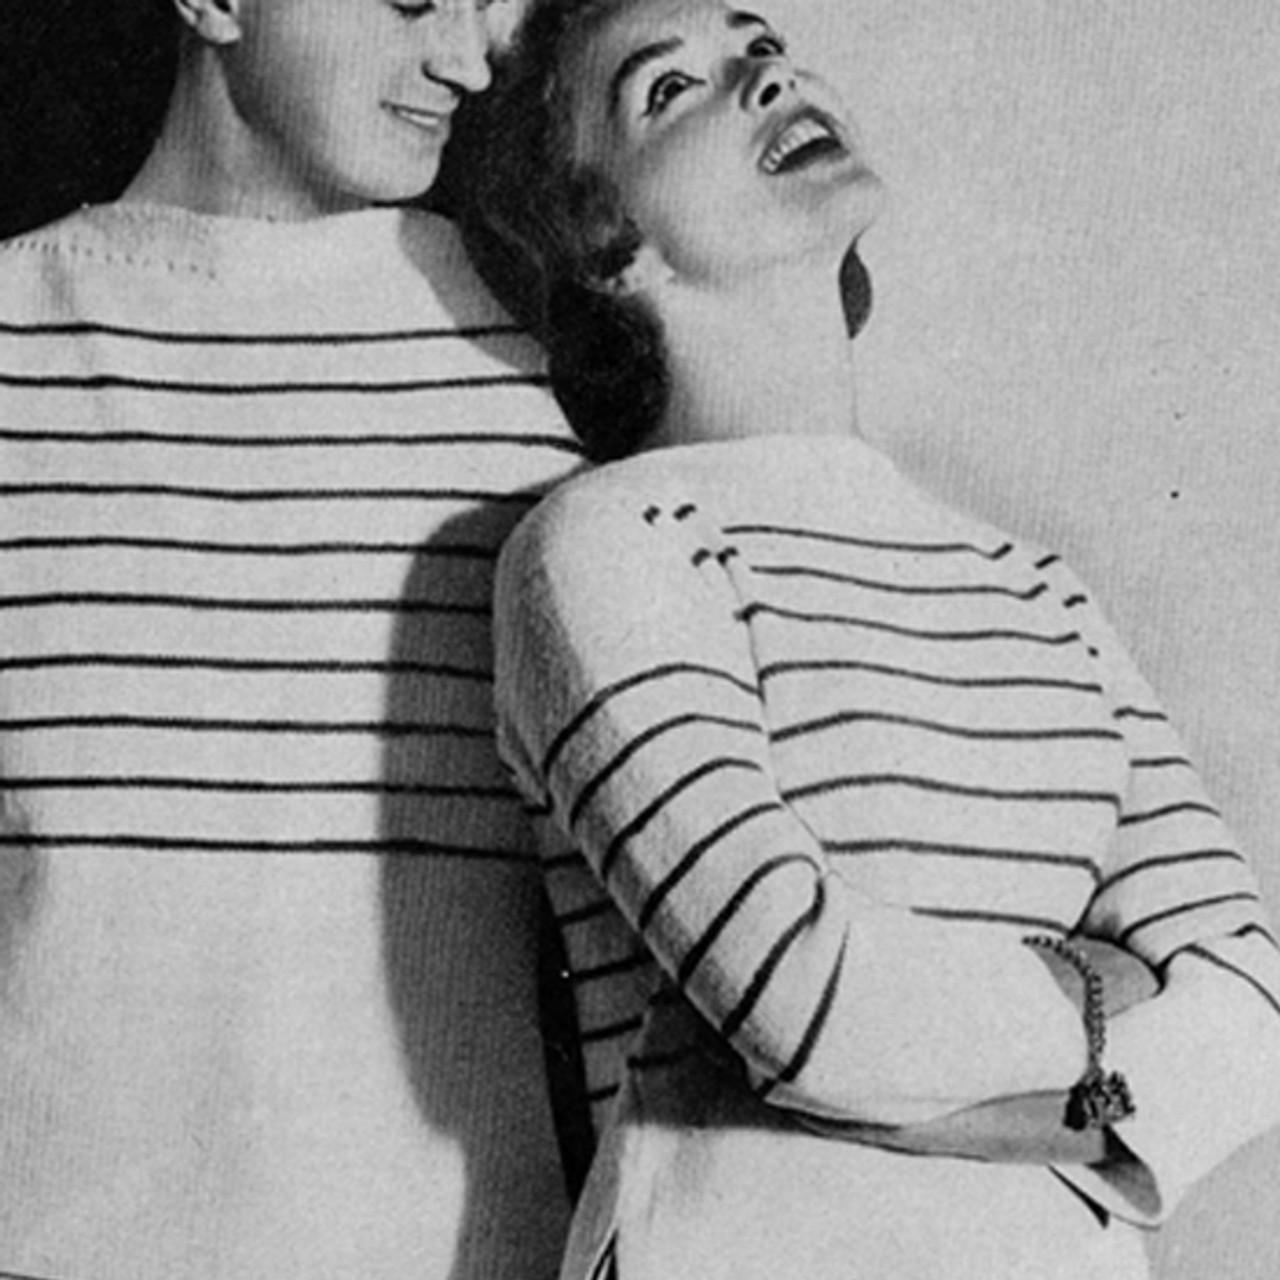 Knitting Pattern His Hers Striped Shirts Pattern